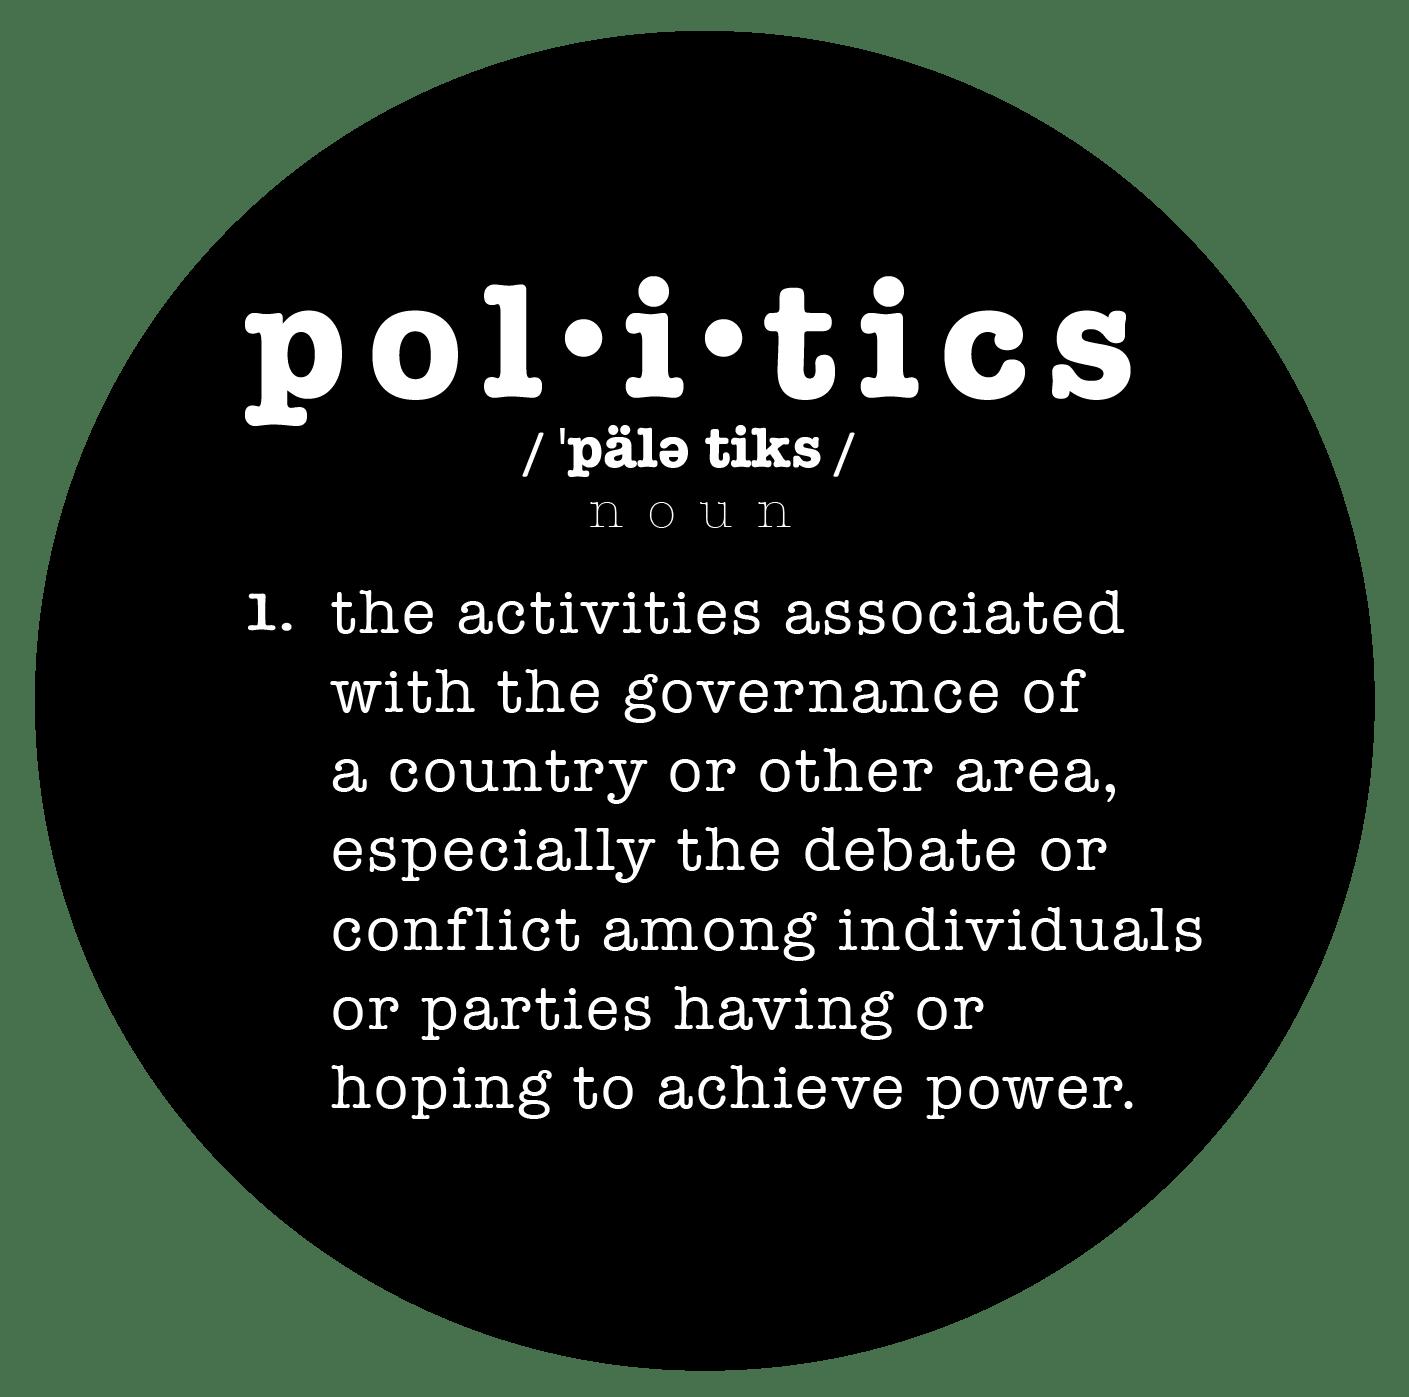 politicsdefinitionimageblack-01